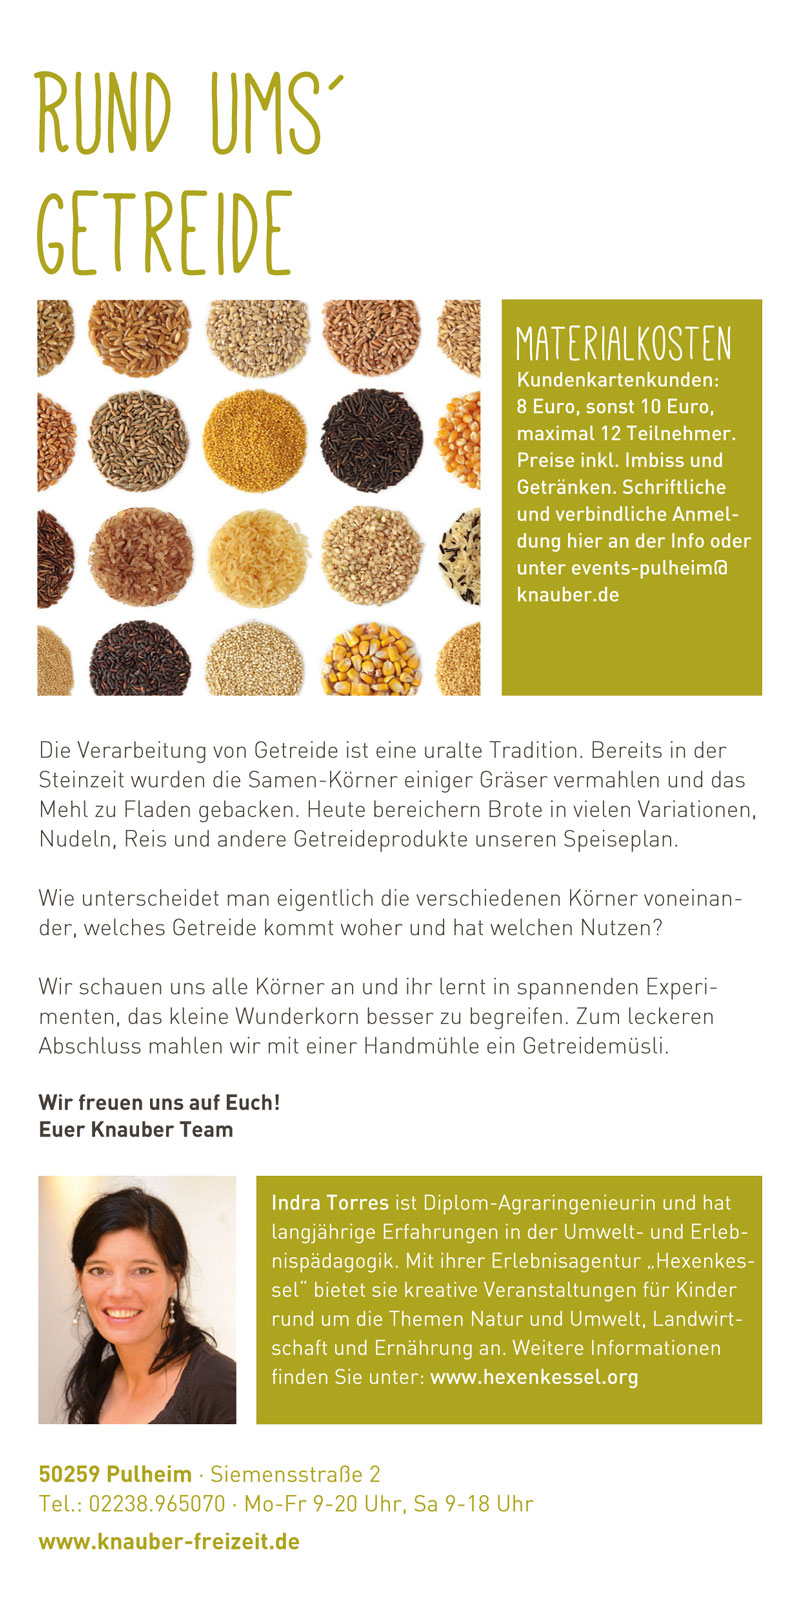 Grafik Design Bonn Kommunikationsdesign Social Media Alexandra Wolf Branding Corporate Design Logo Gestaltung Flyer Web 2.0 Text knauber anzeige Portfolio Showcase